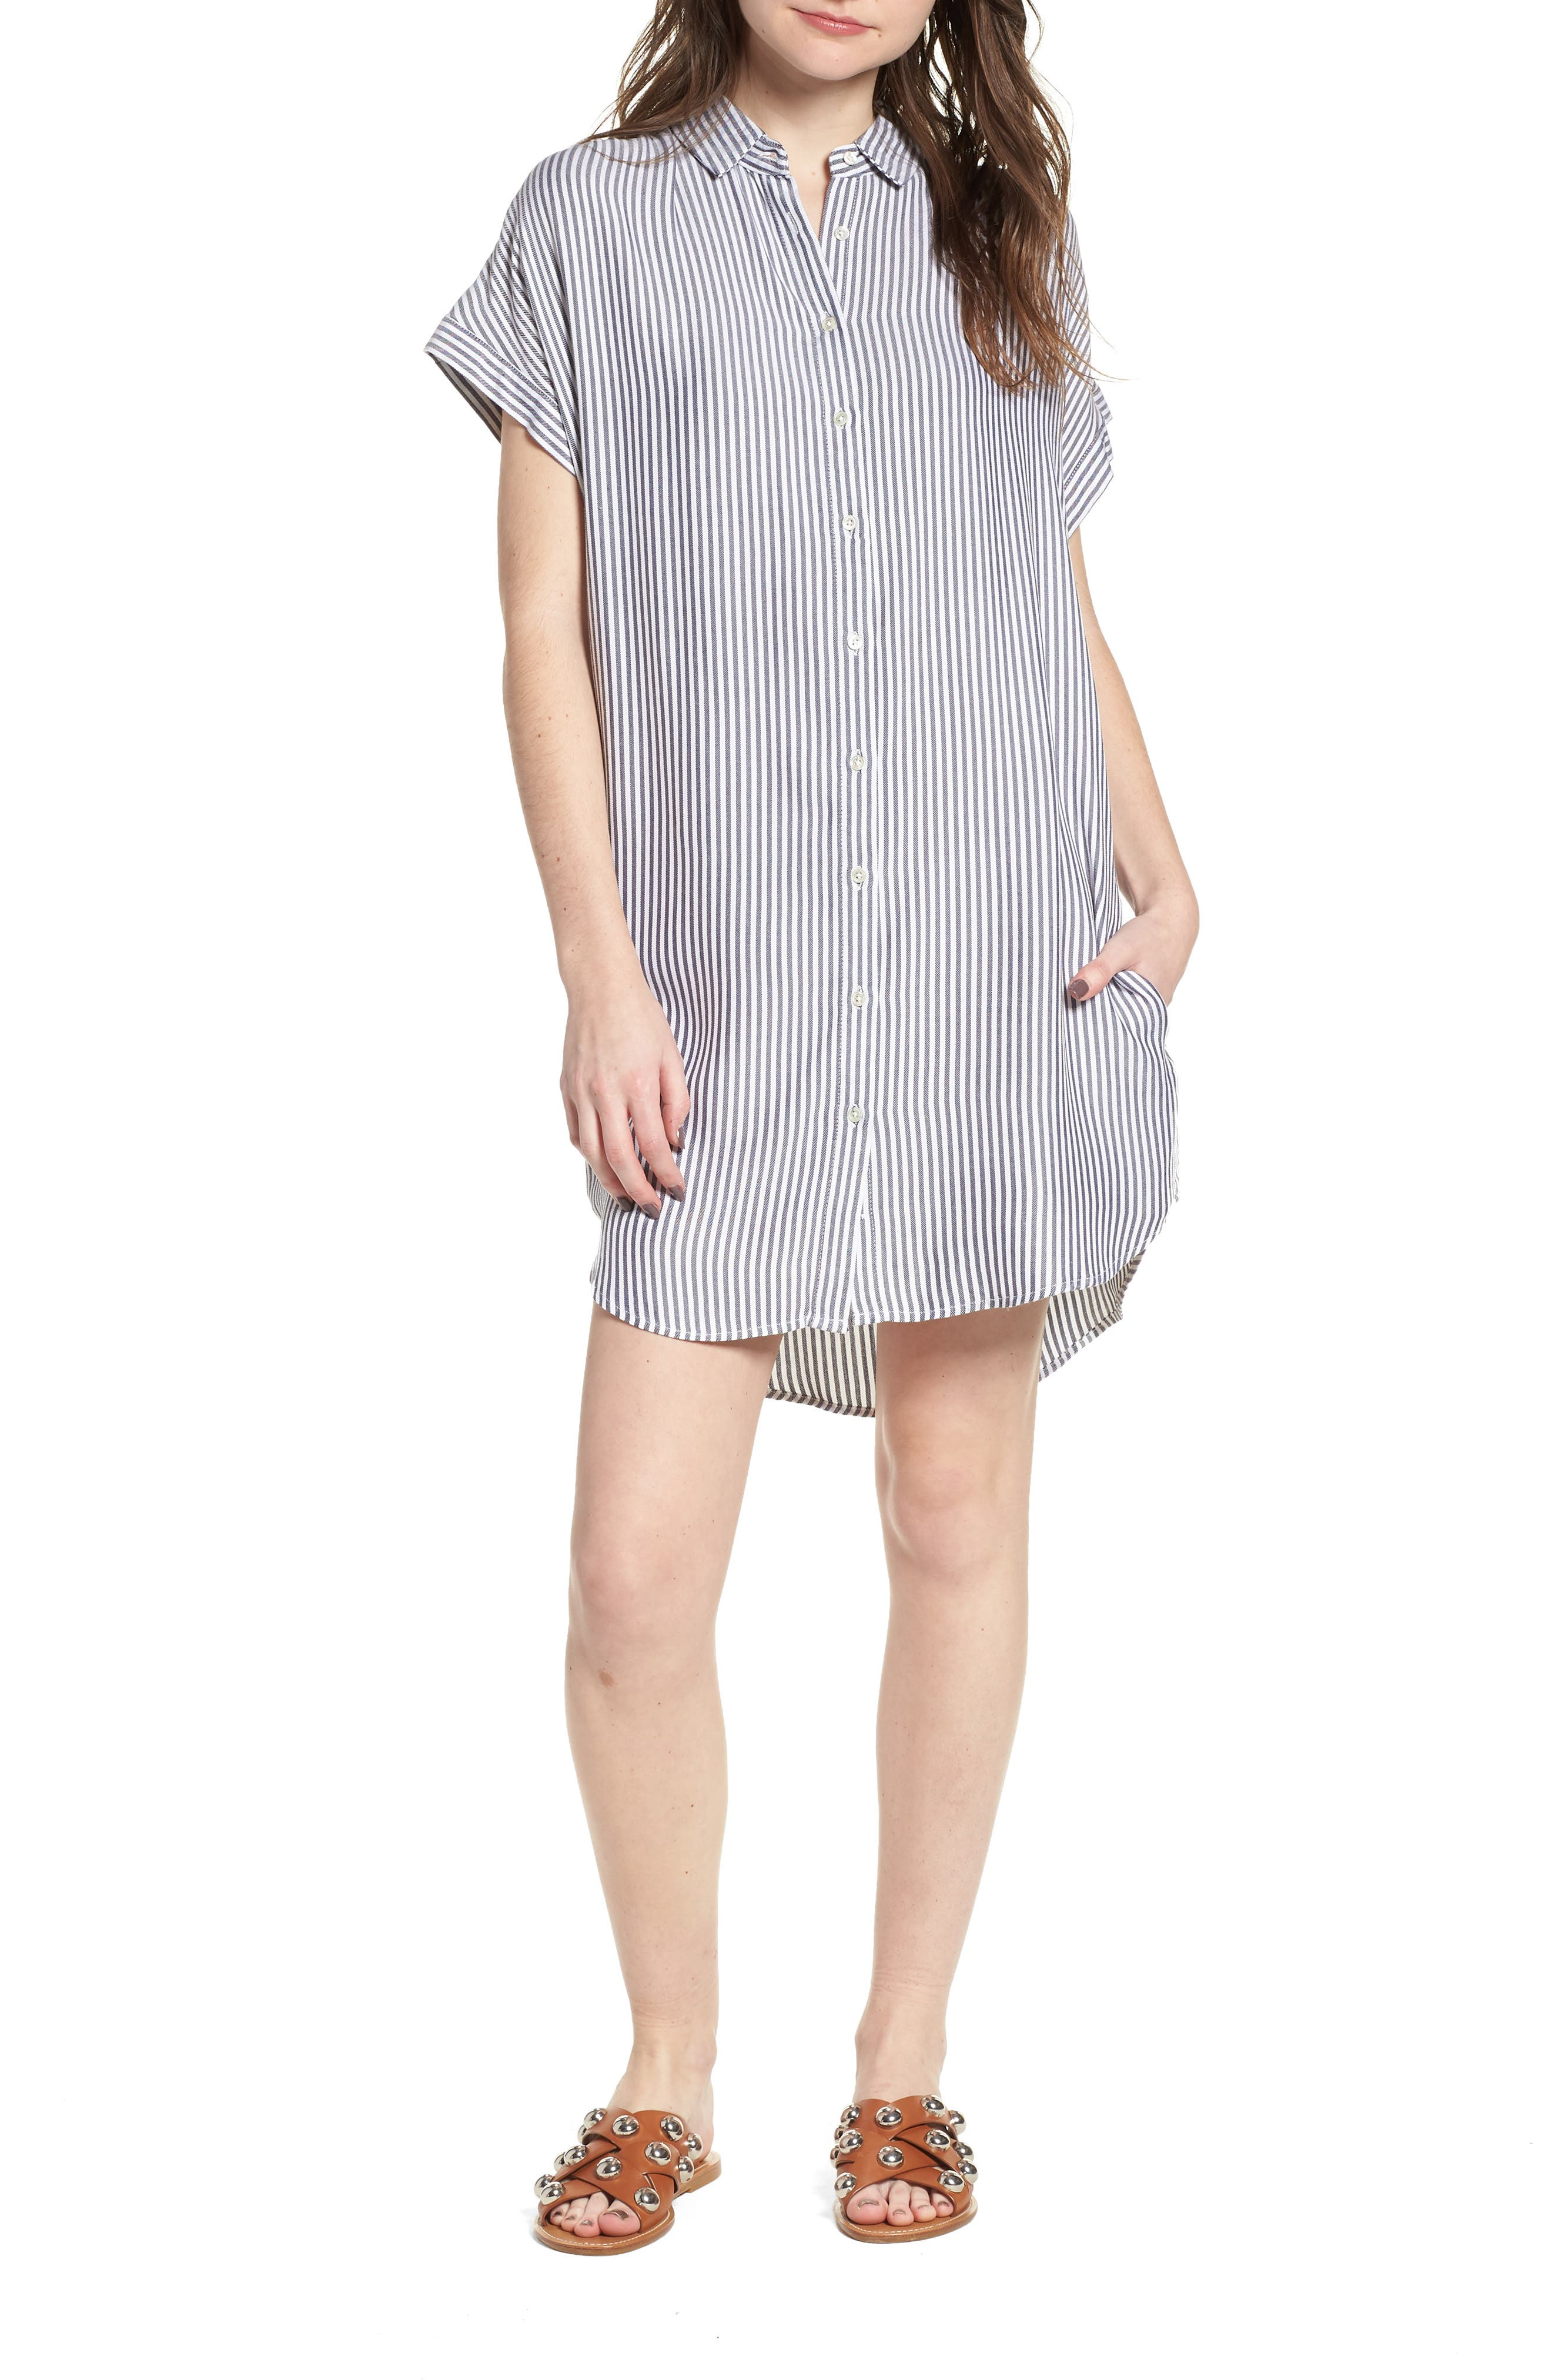 Skipper Stripe Shirtdress,                             Main thumbnail 1, color,                             400